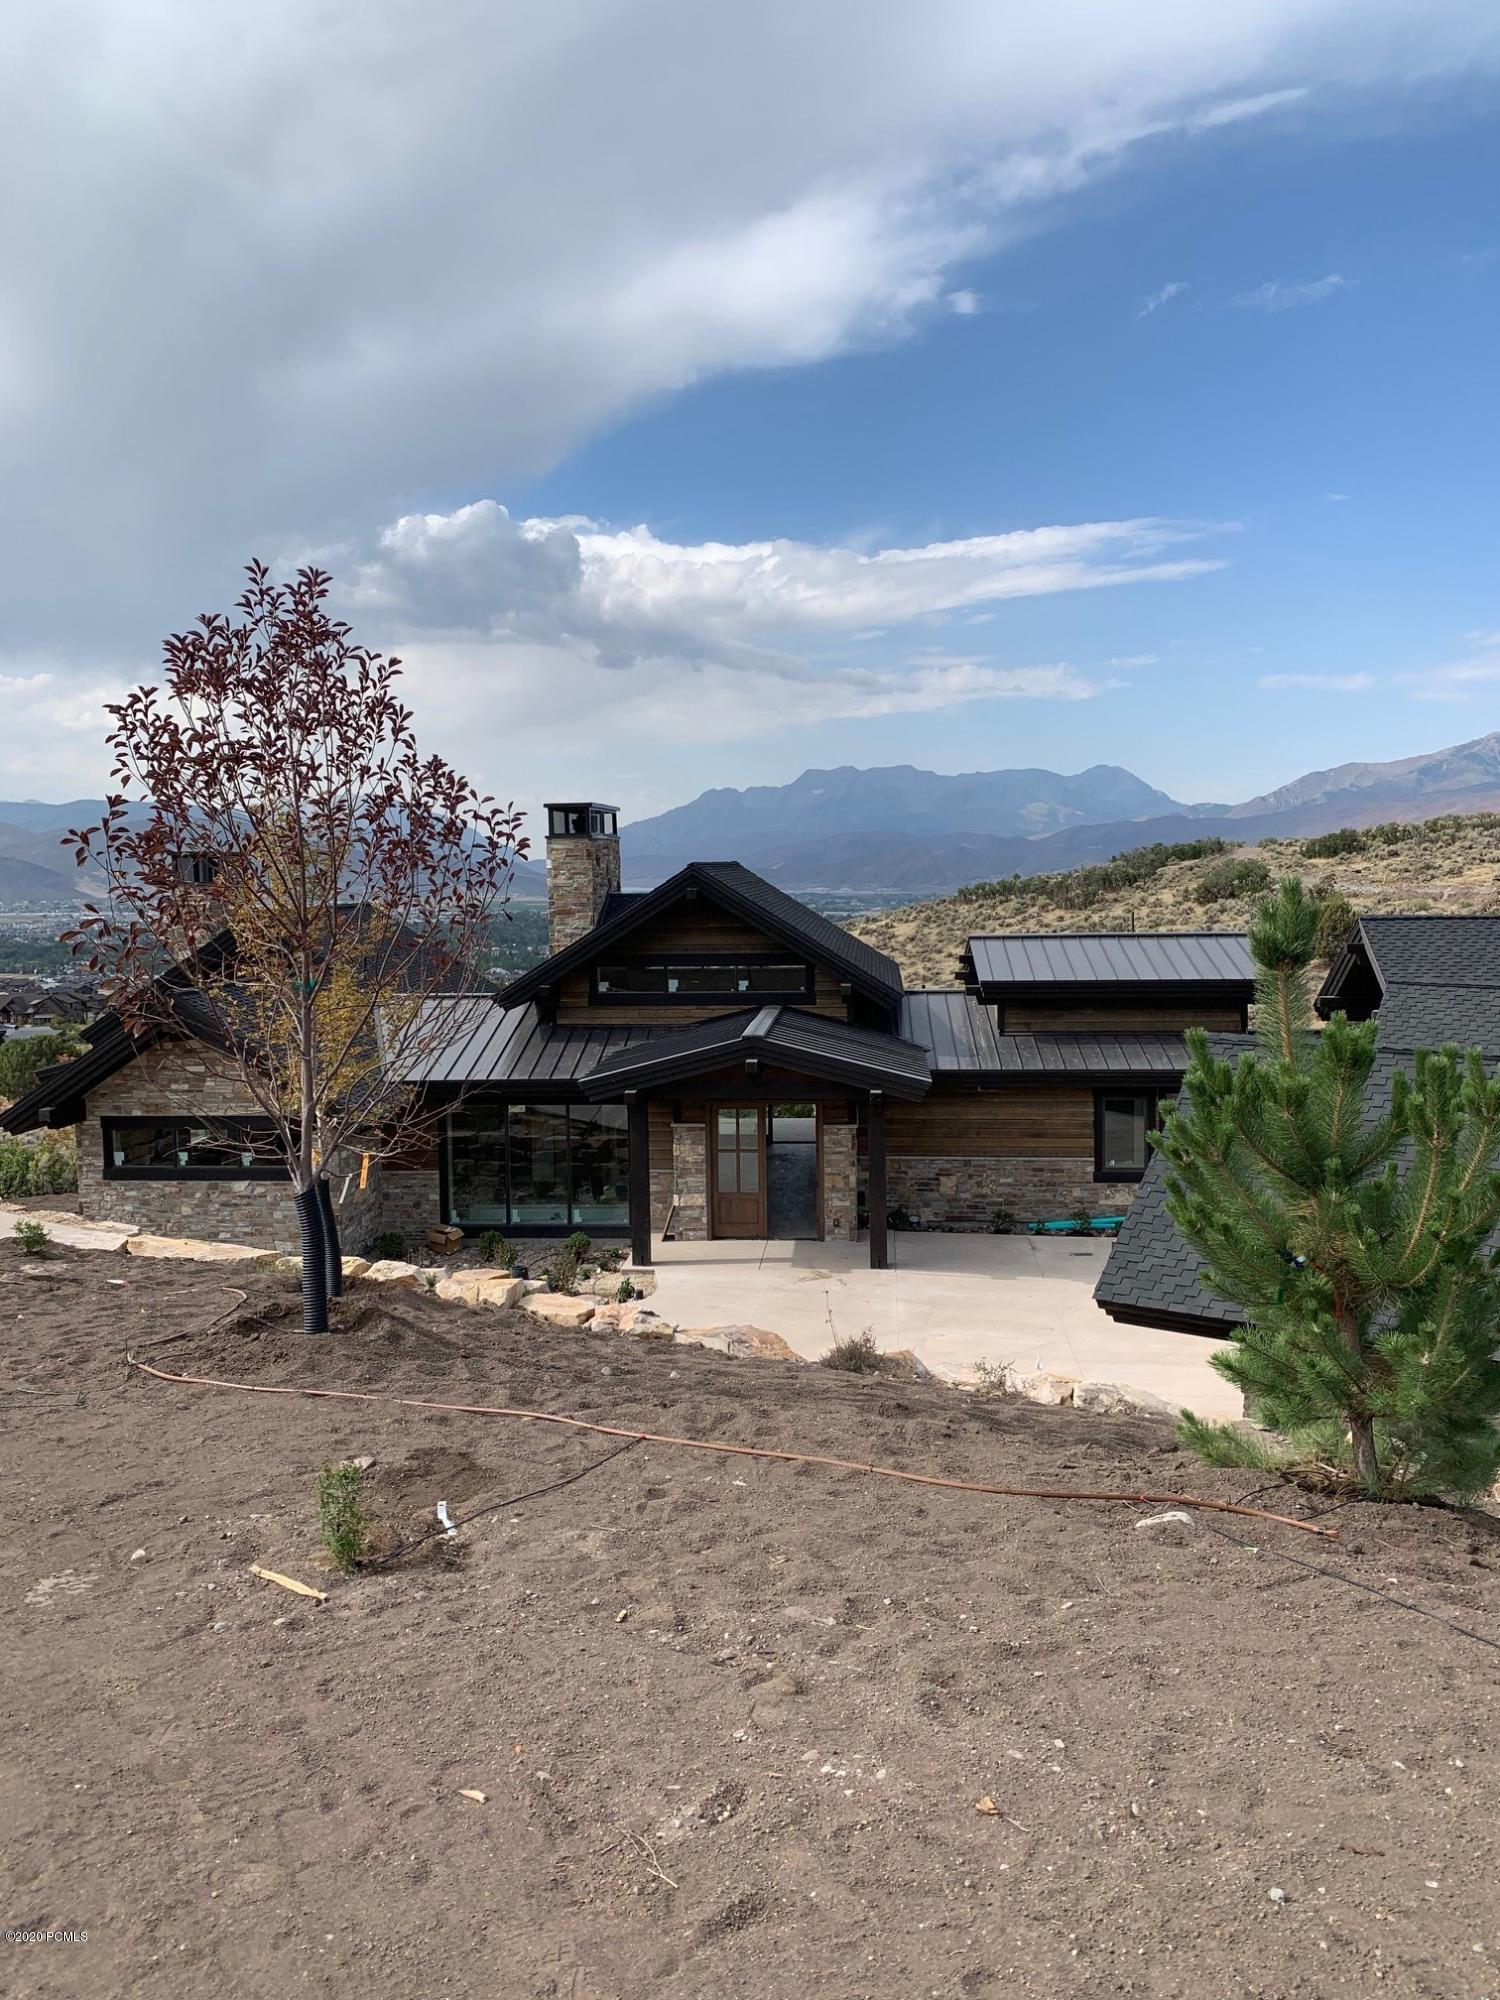 1689 Chimney Rock Rd (Lot 527), Heber City, Utah 84032, 5 Bedrooms Bedrooms, ,6 BathroomsBathrooms,Single Family,For Sale,Chimney Rock Rd (Lot 527),12001561